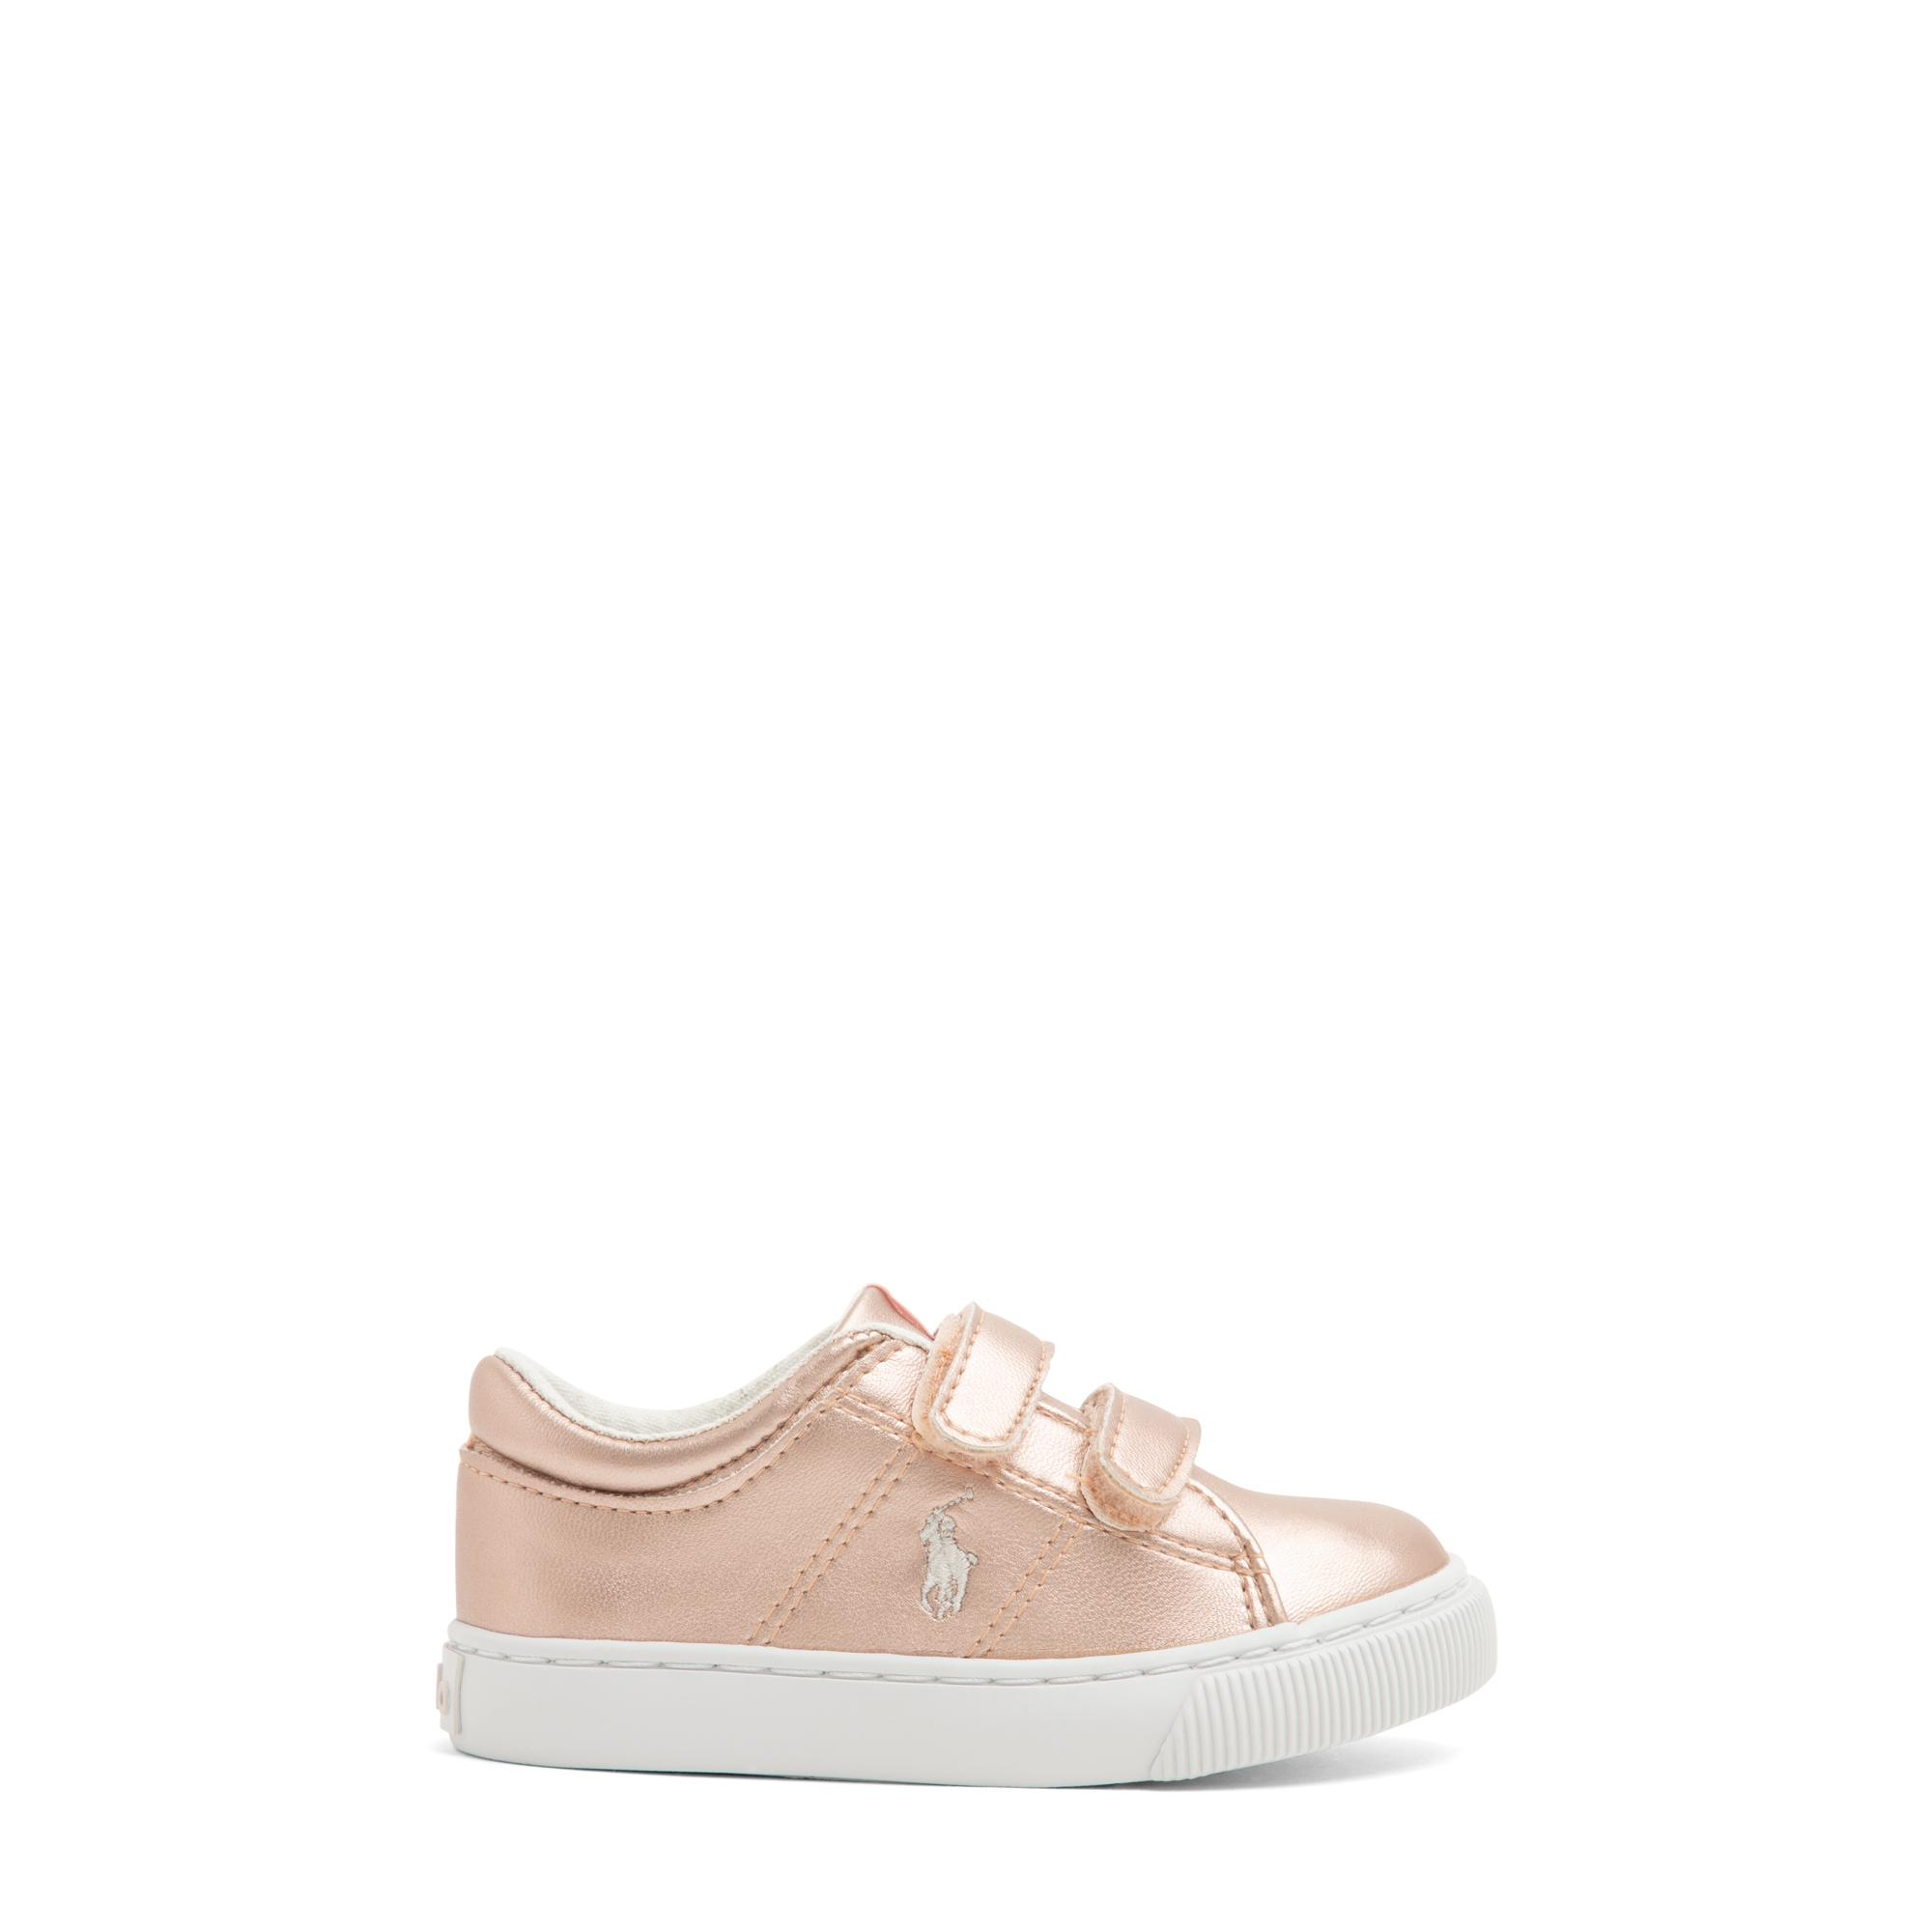 Elmwood EZ sneakers